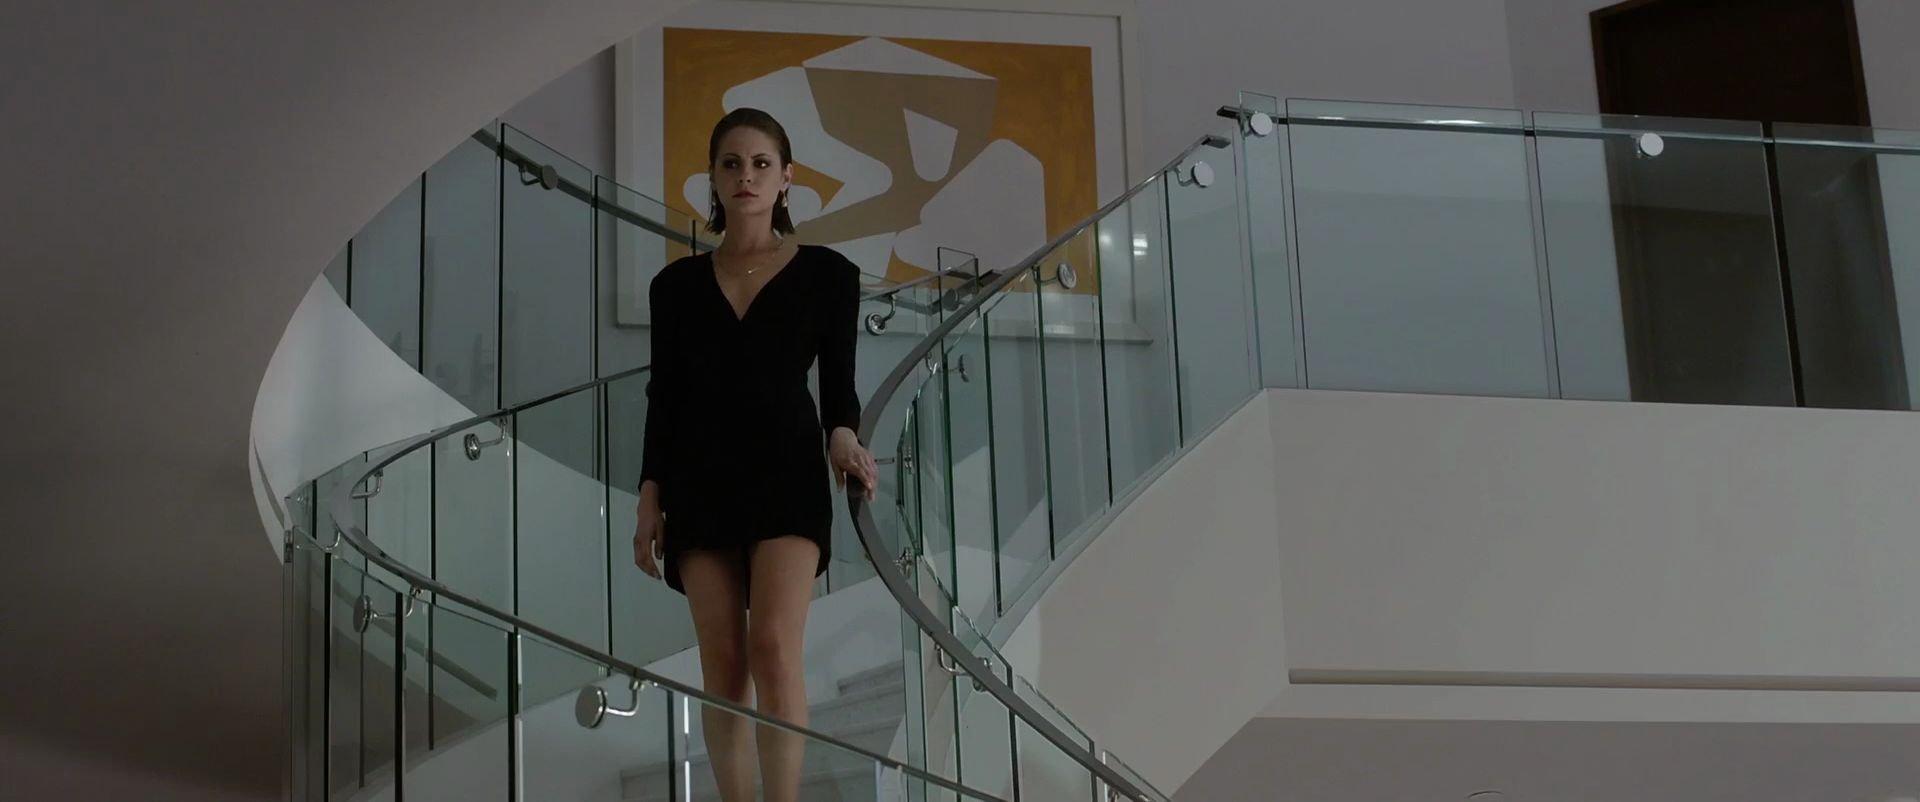 Willa holland naked fakes